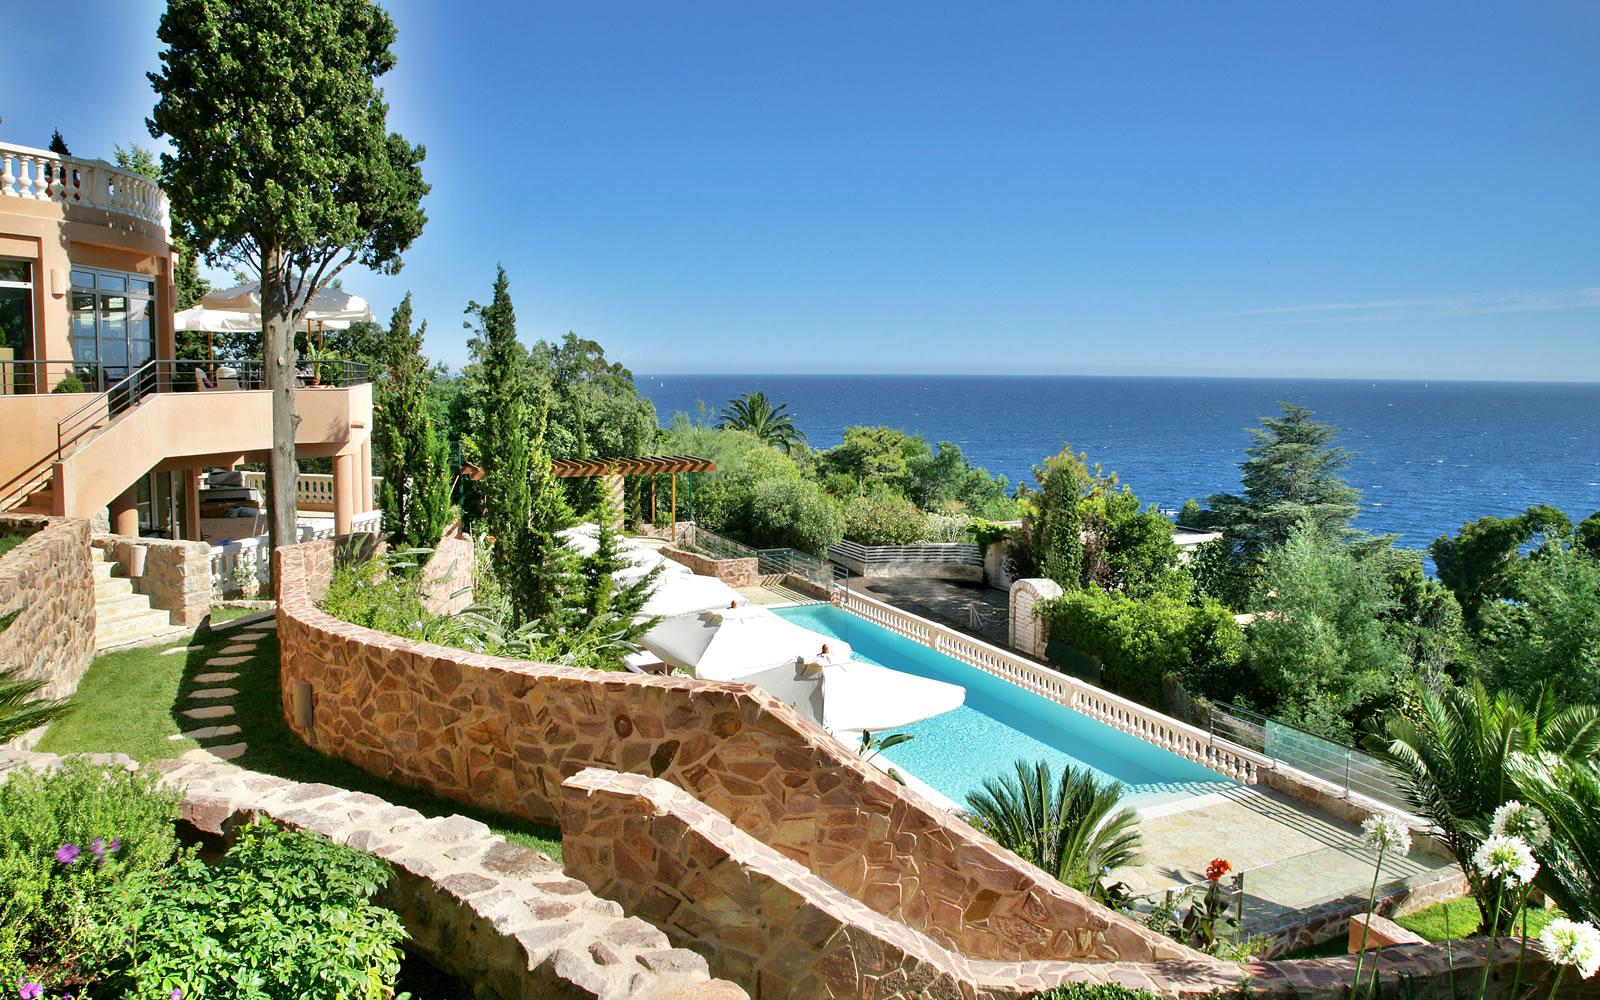 French Riviera Babymoon at Tiara Yaktsa